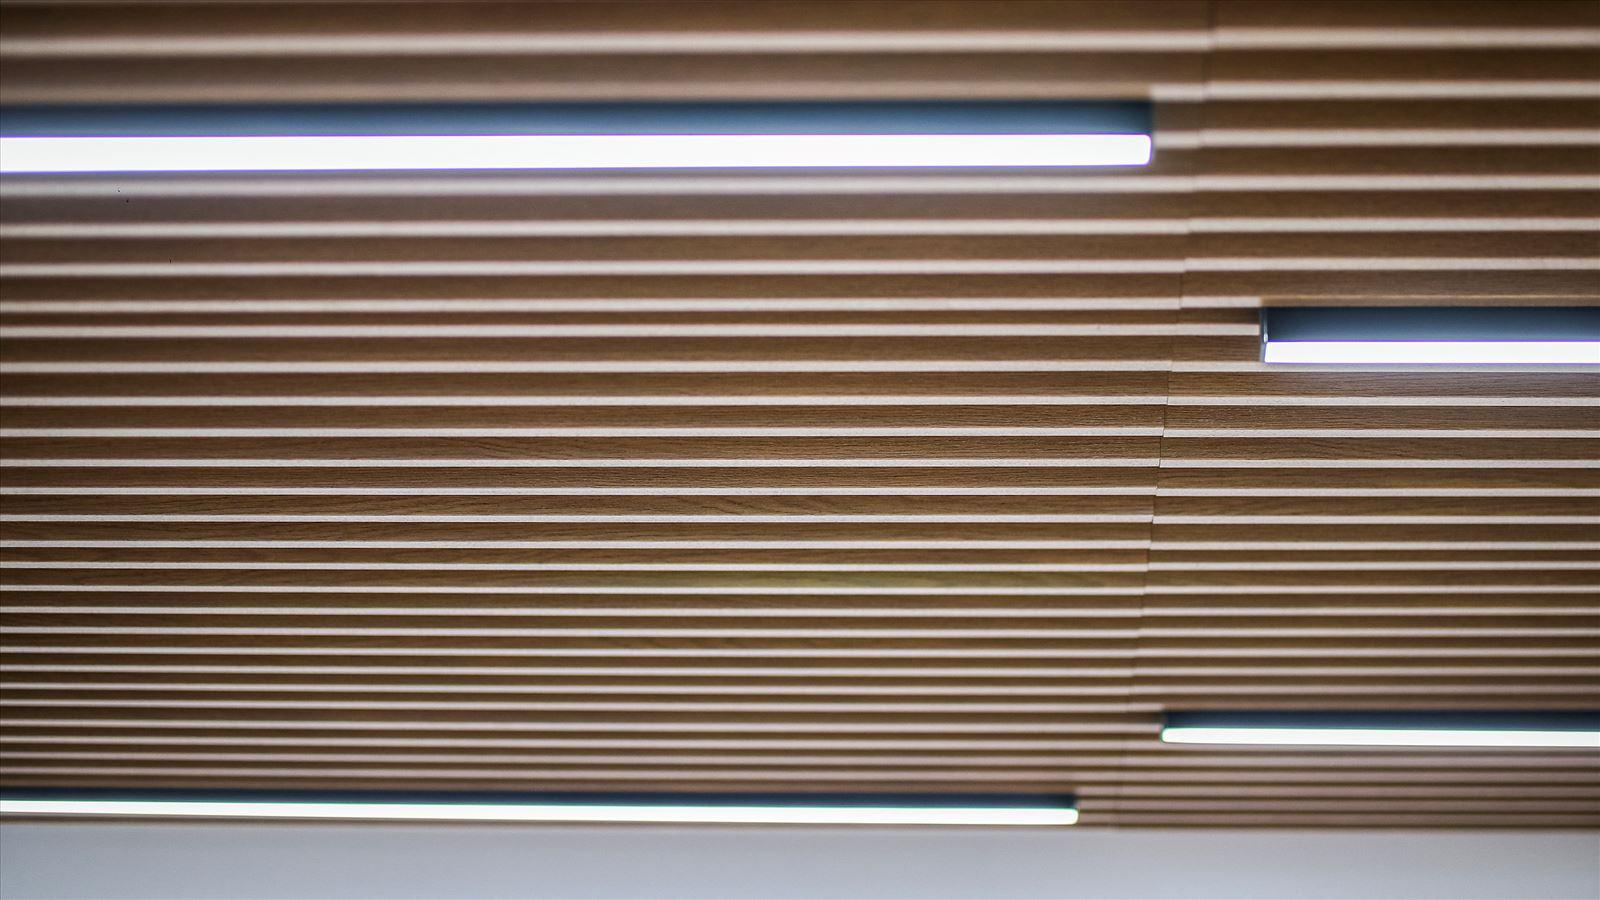 Pie Technology Office - תאורת תקרה על ידי קמחי תאורה